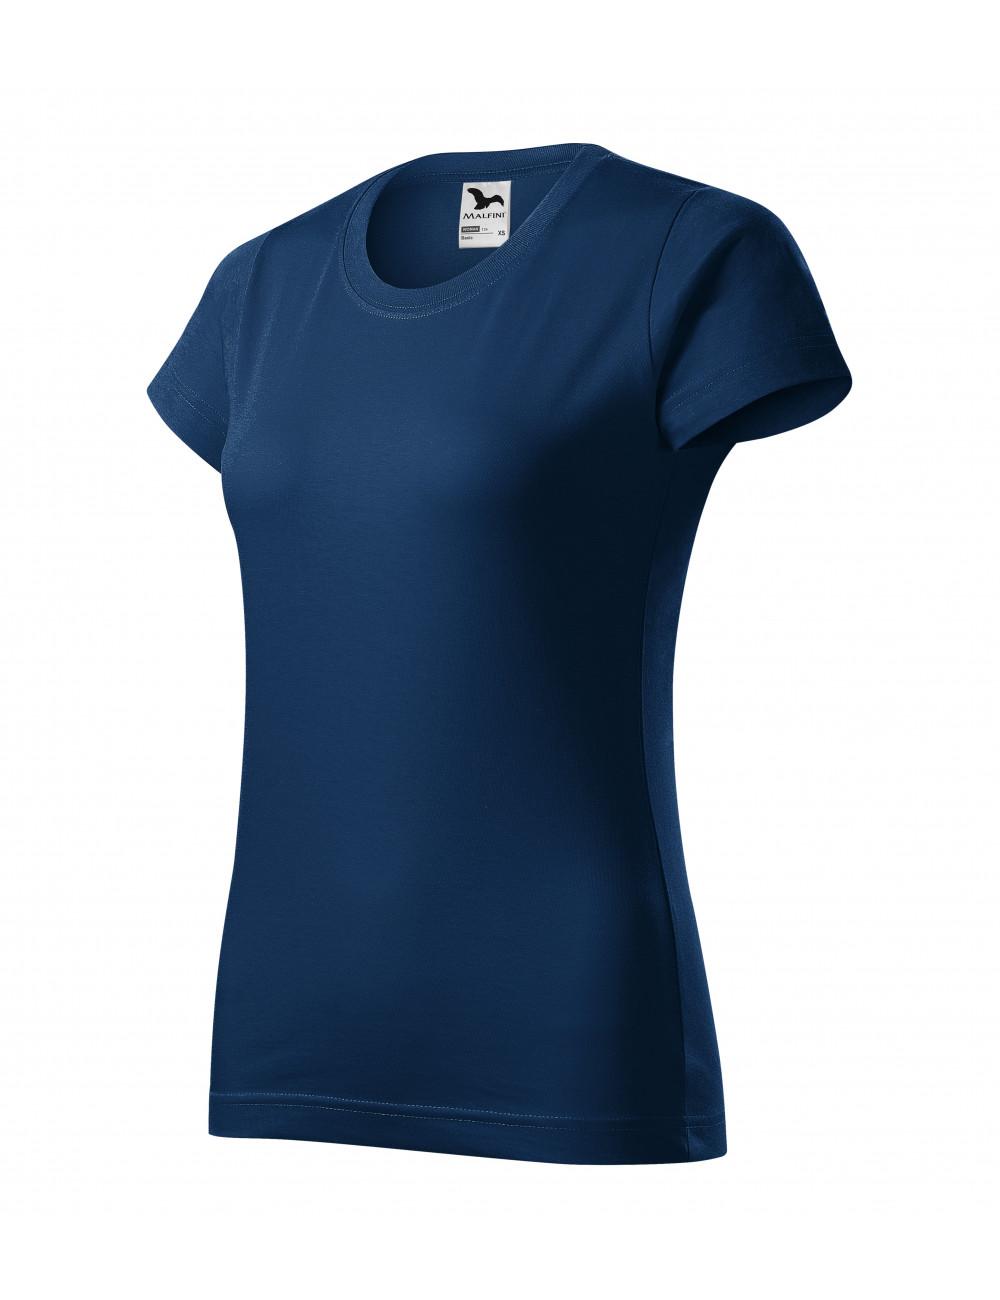 Adler MALFINI Koszulka damska Basic 134 ciemnoniebieski